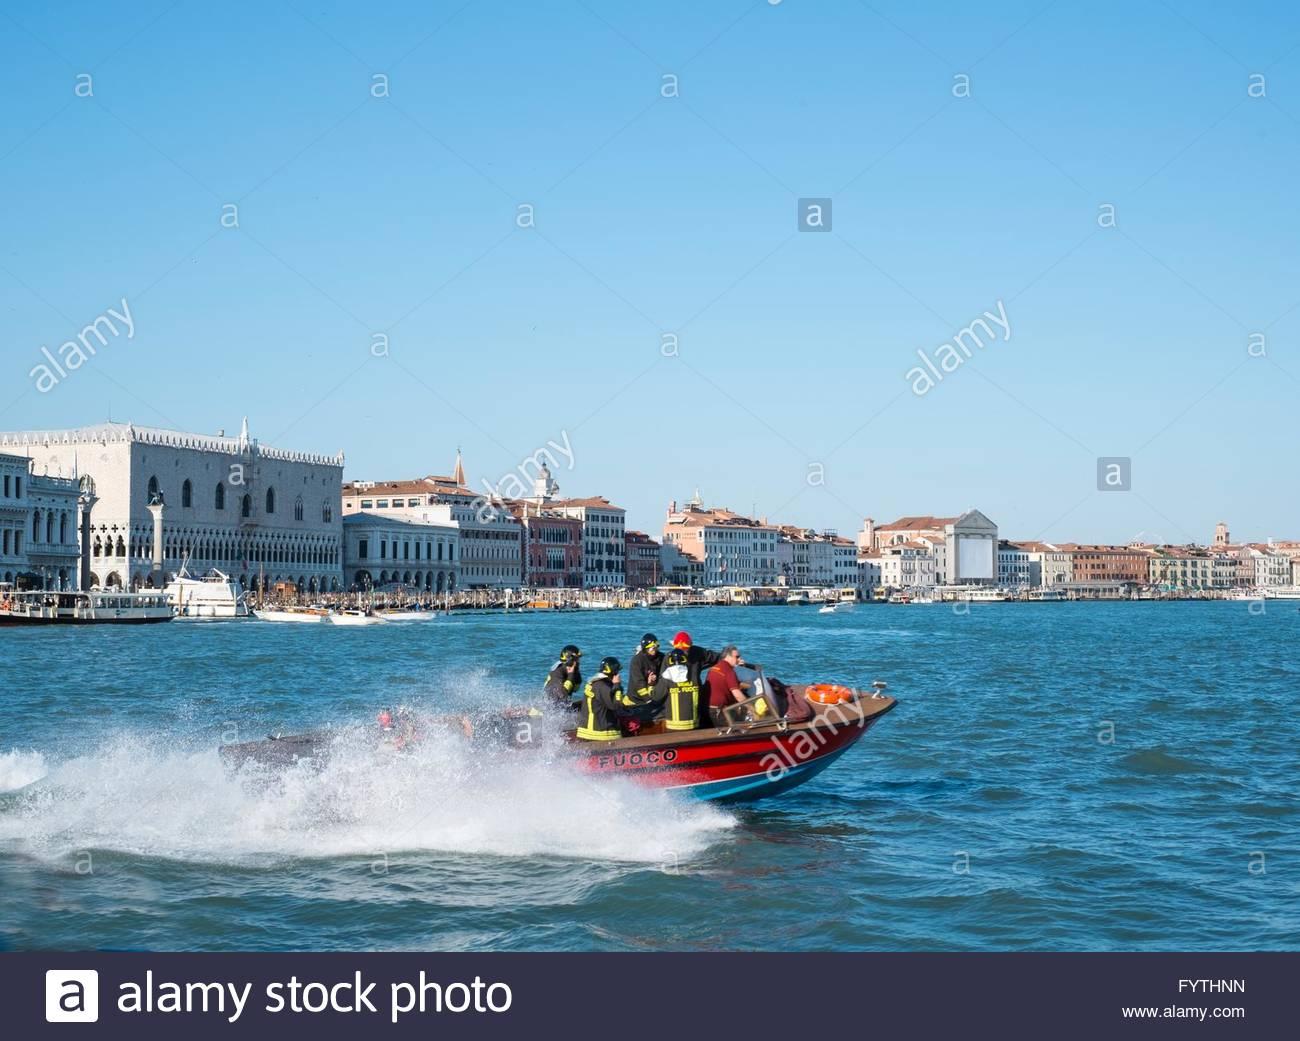 Feuer Boot Beantwortung Aufruf, Venedig, Italien, April. Stockbild